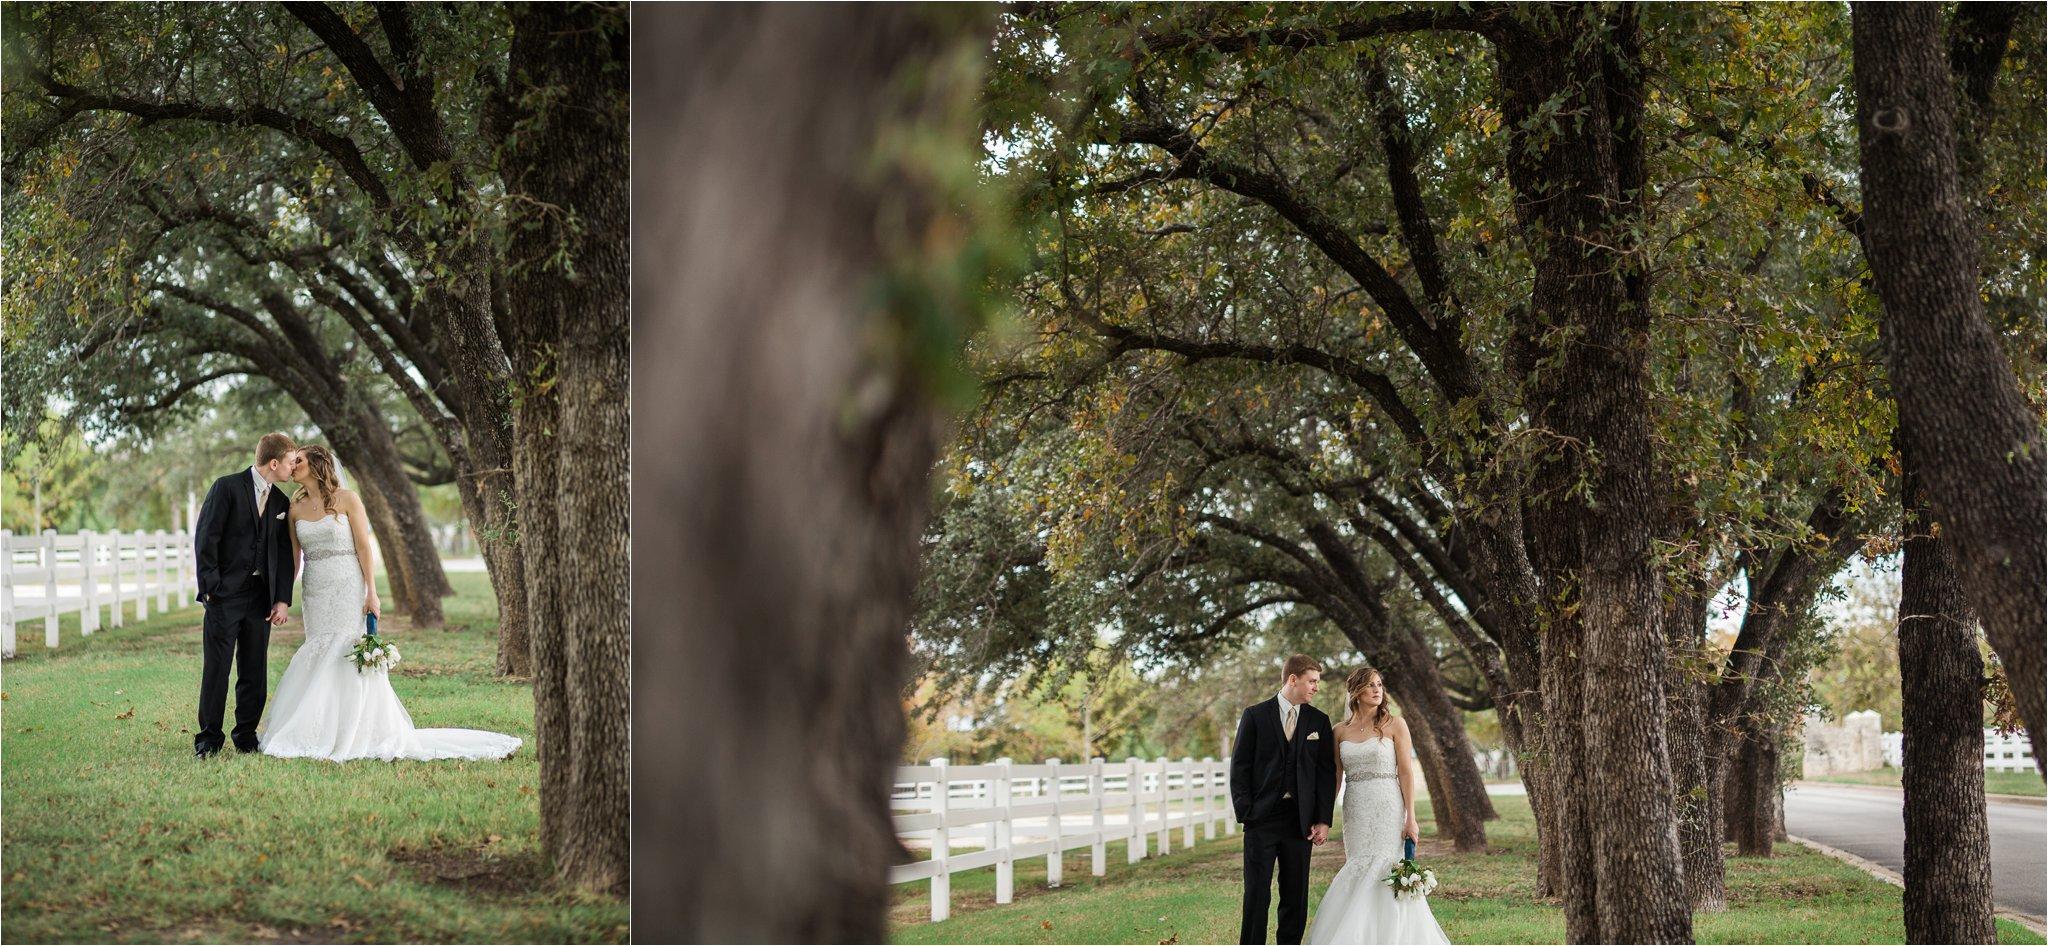 lunsford-wedding-349.jpg